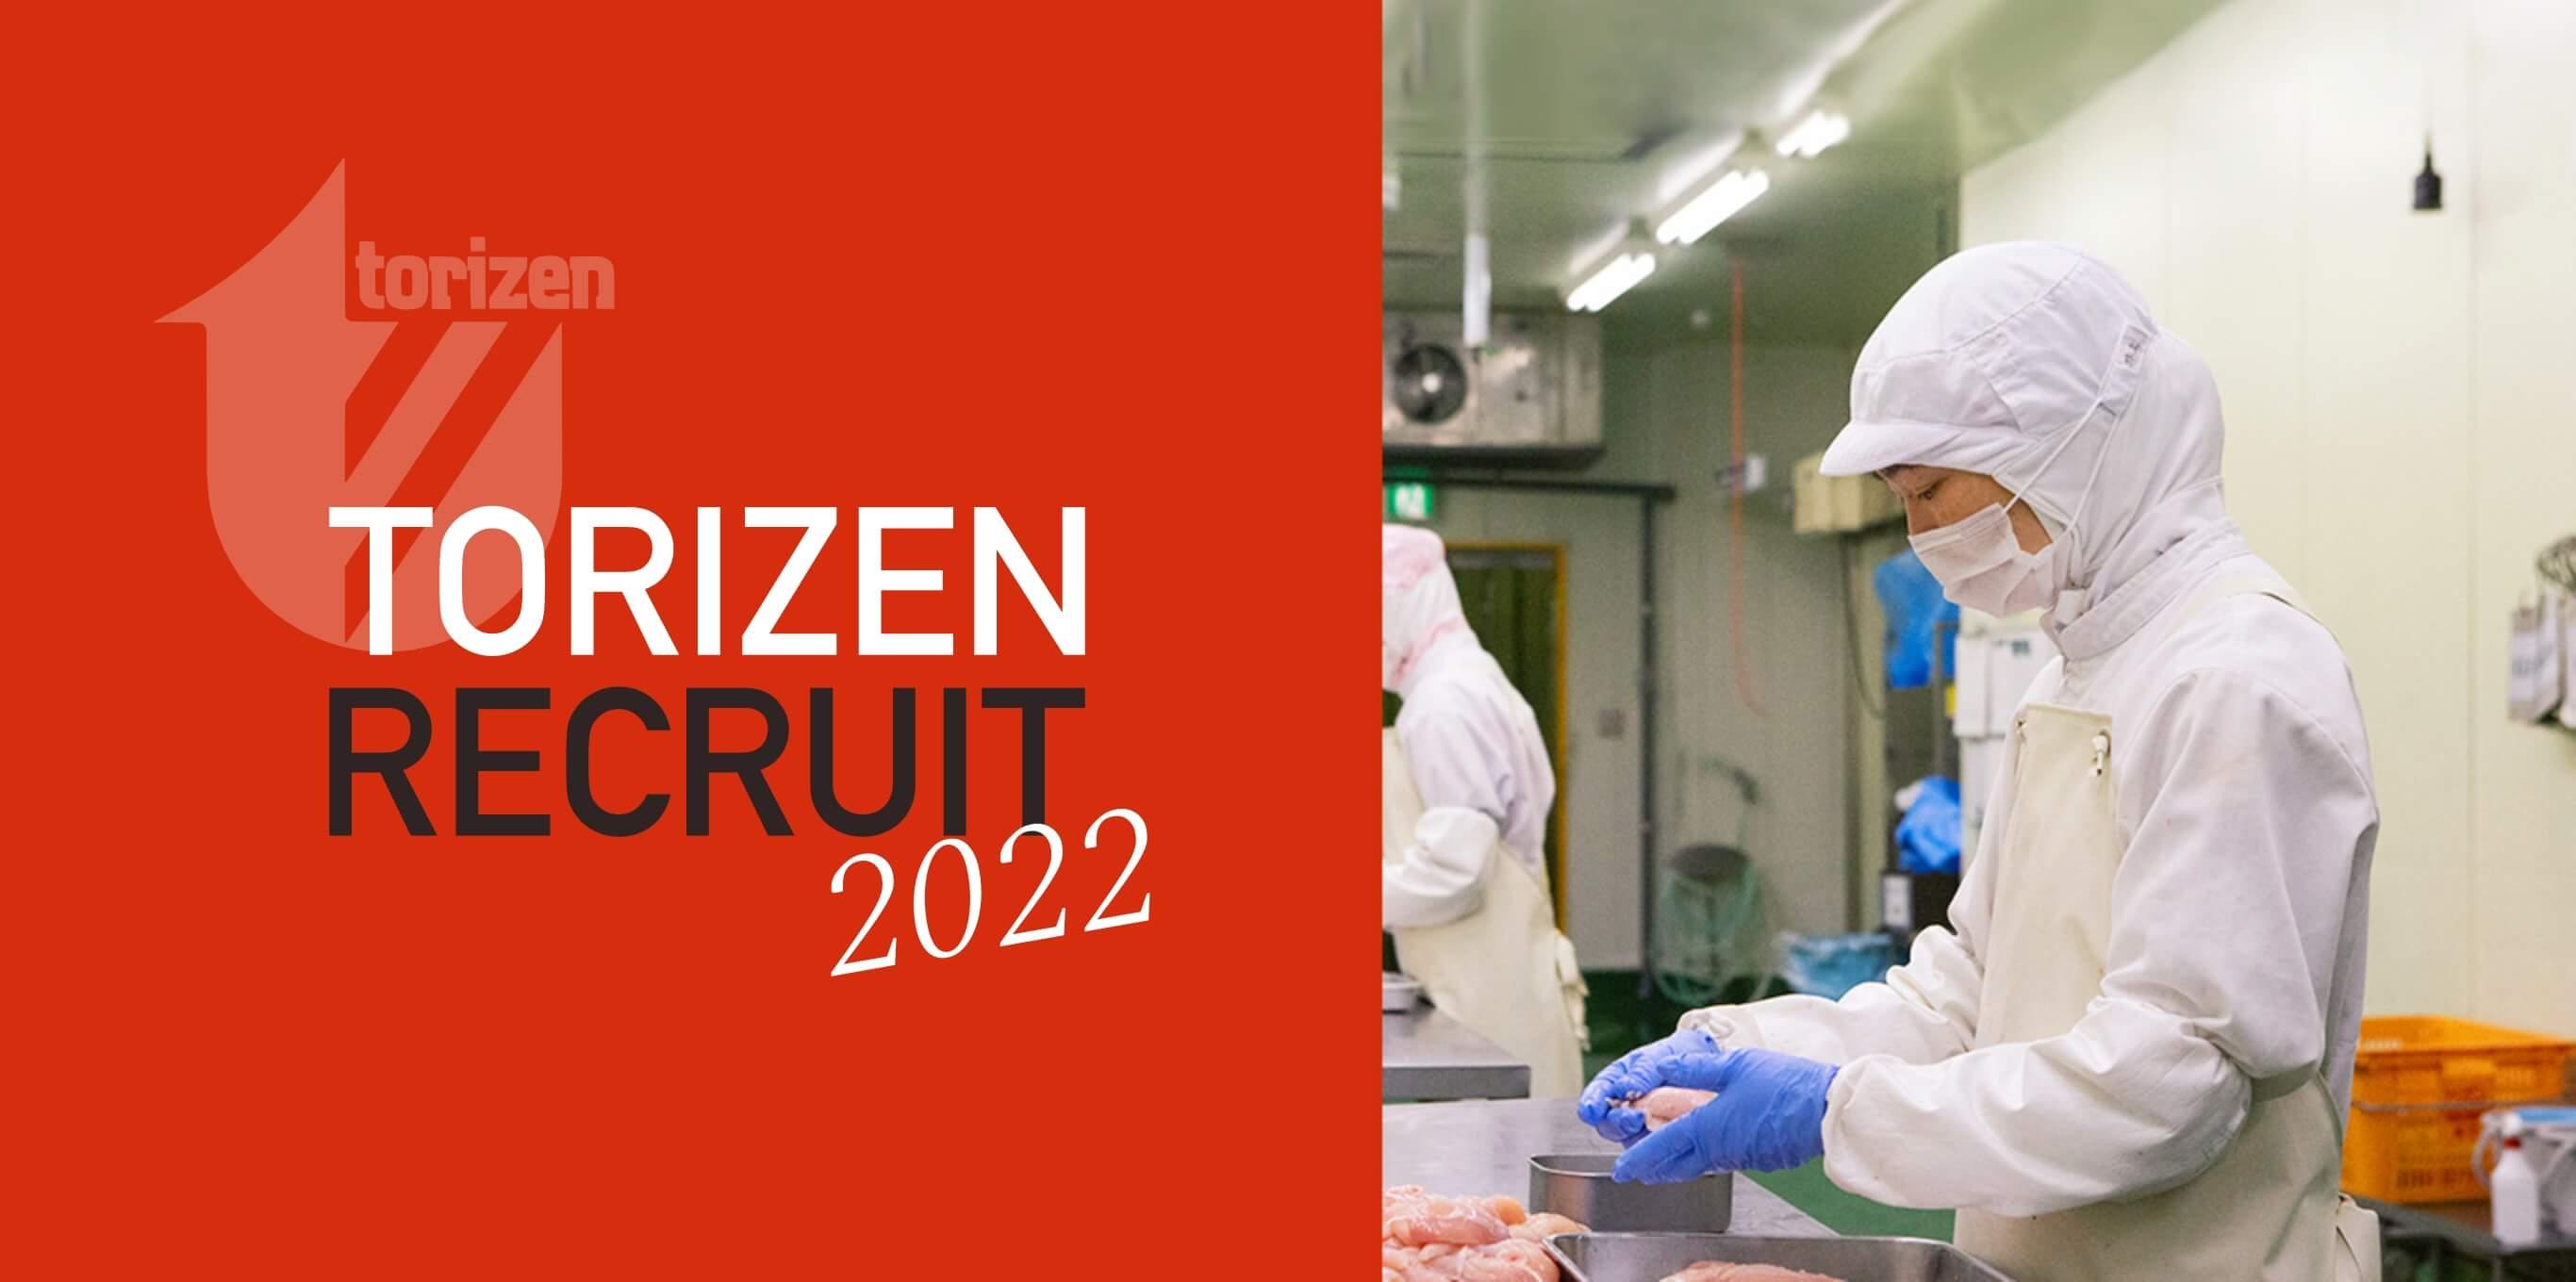 Torizen recruit 2022